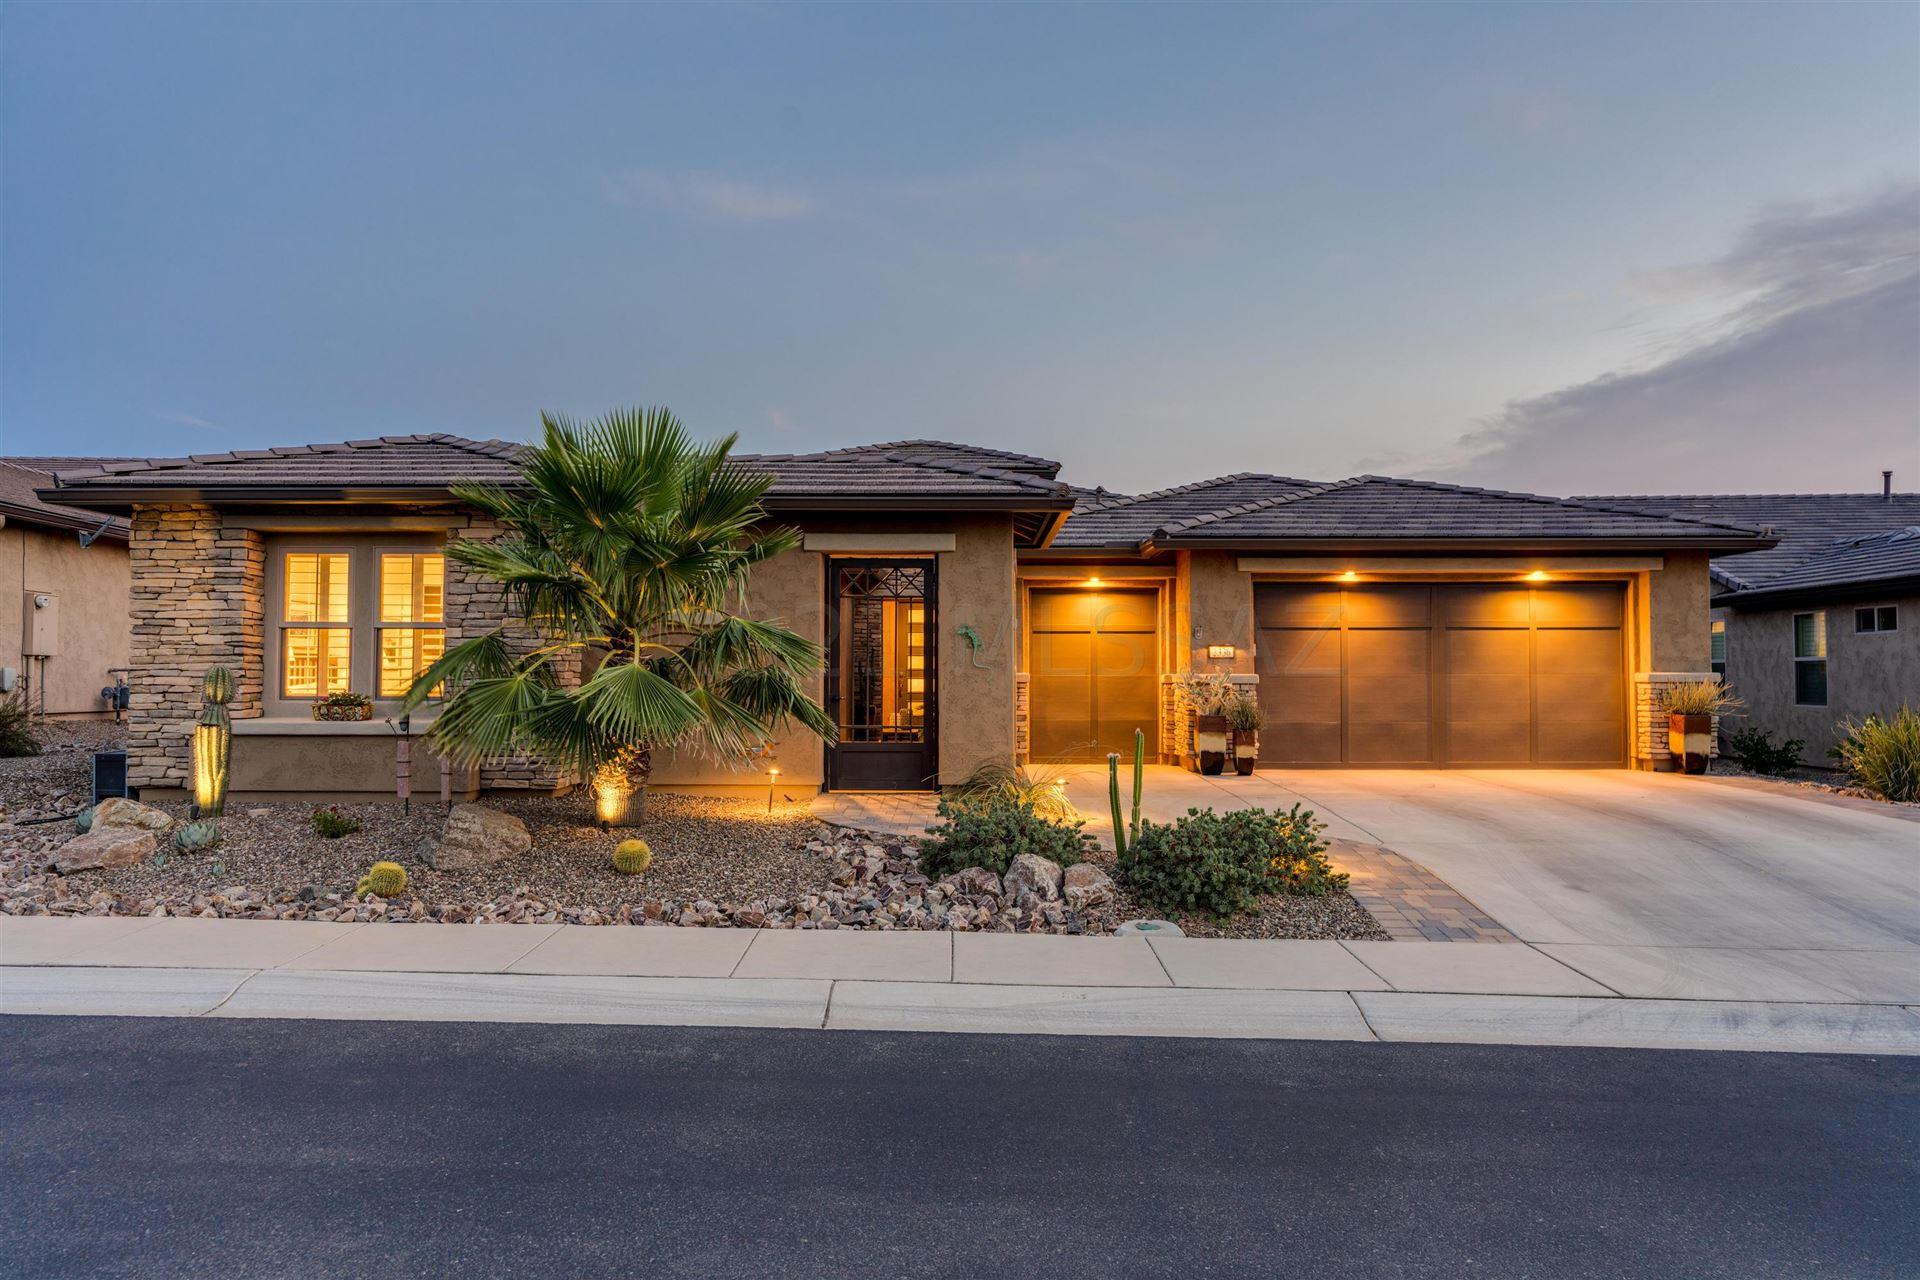 2336 E Madera Plateau Drive, Green Valley, AZ 85614 - MLS#: 22115898